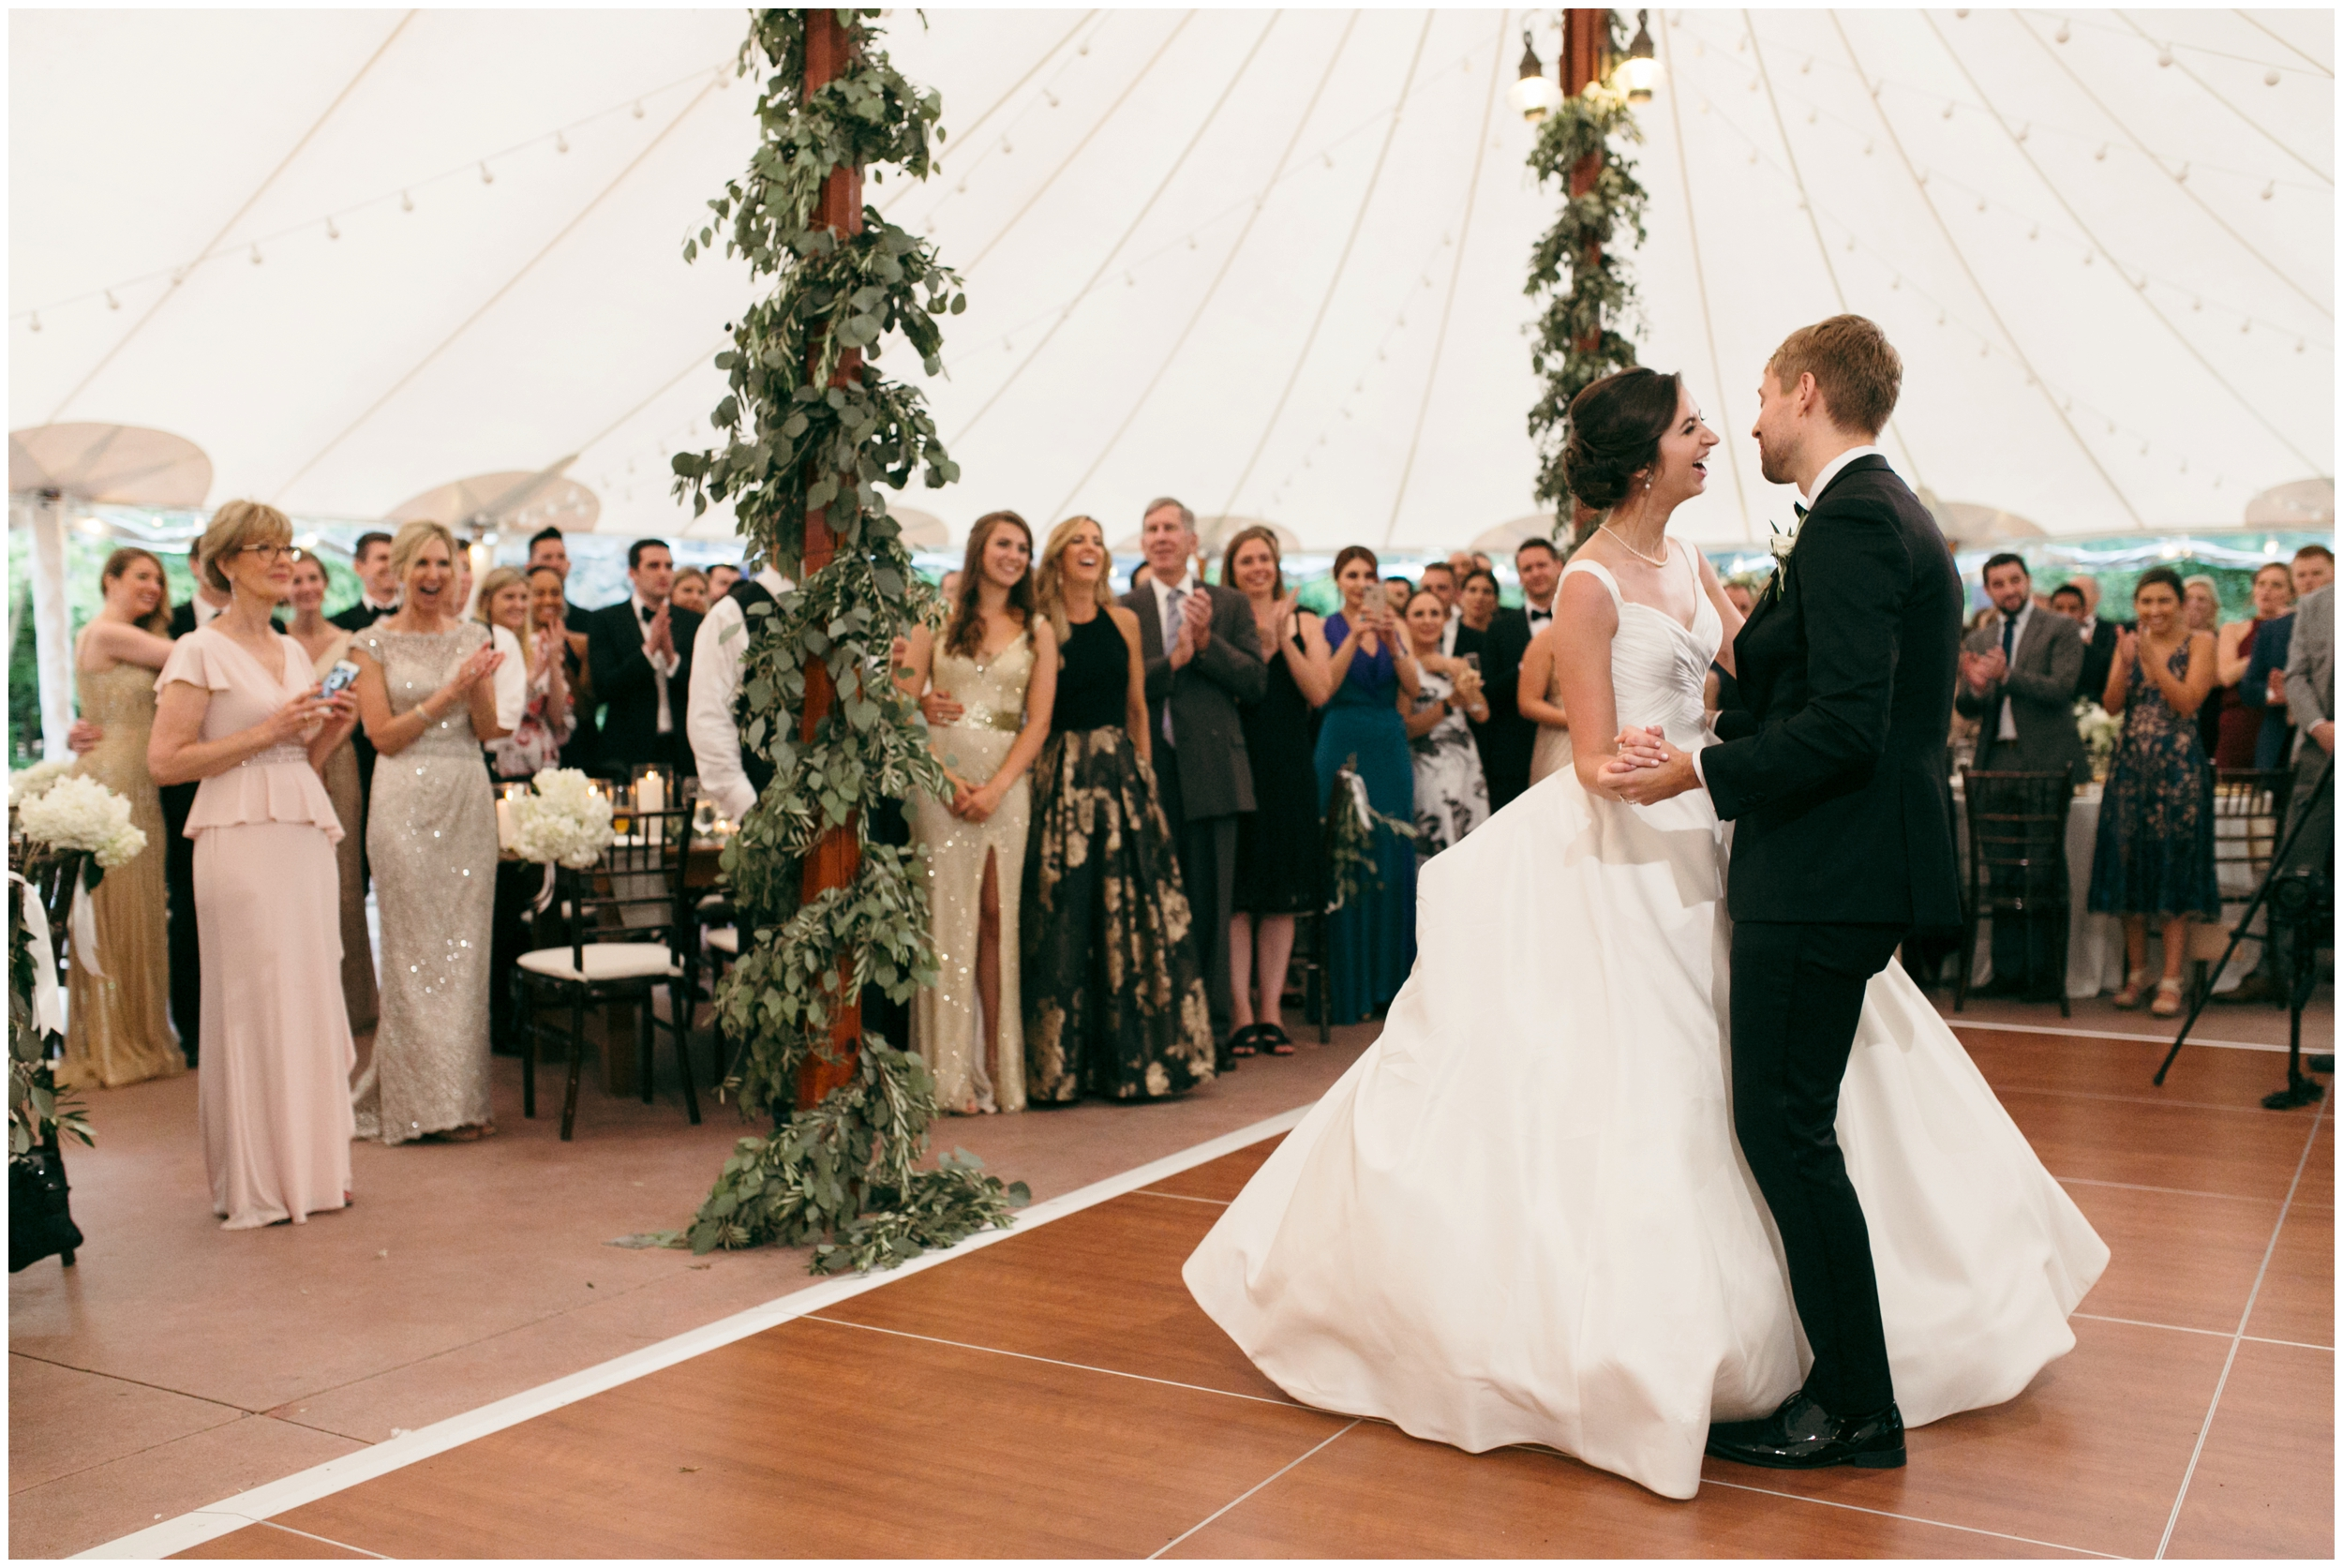 Willowdale-Estate-Wedding-Bailey-Q-Photo-Boston-Wedding-Photographer-081.JPG